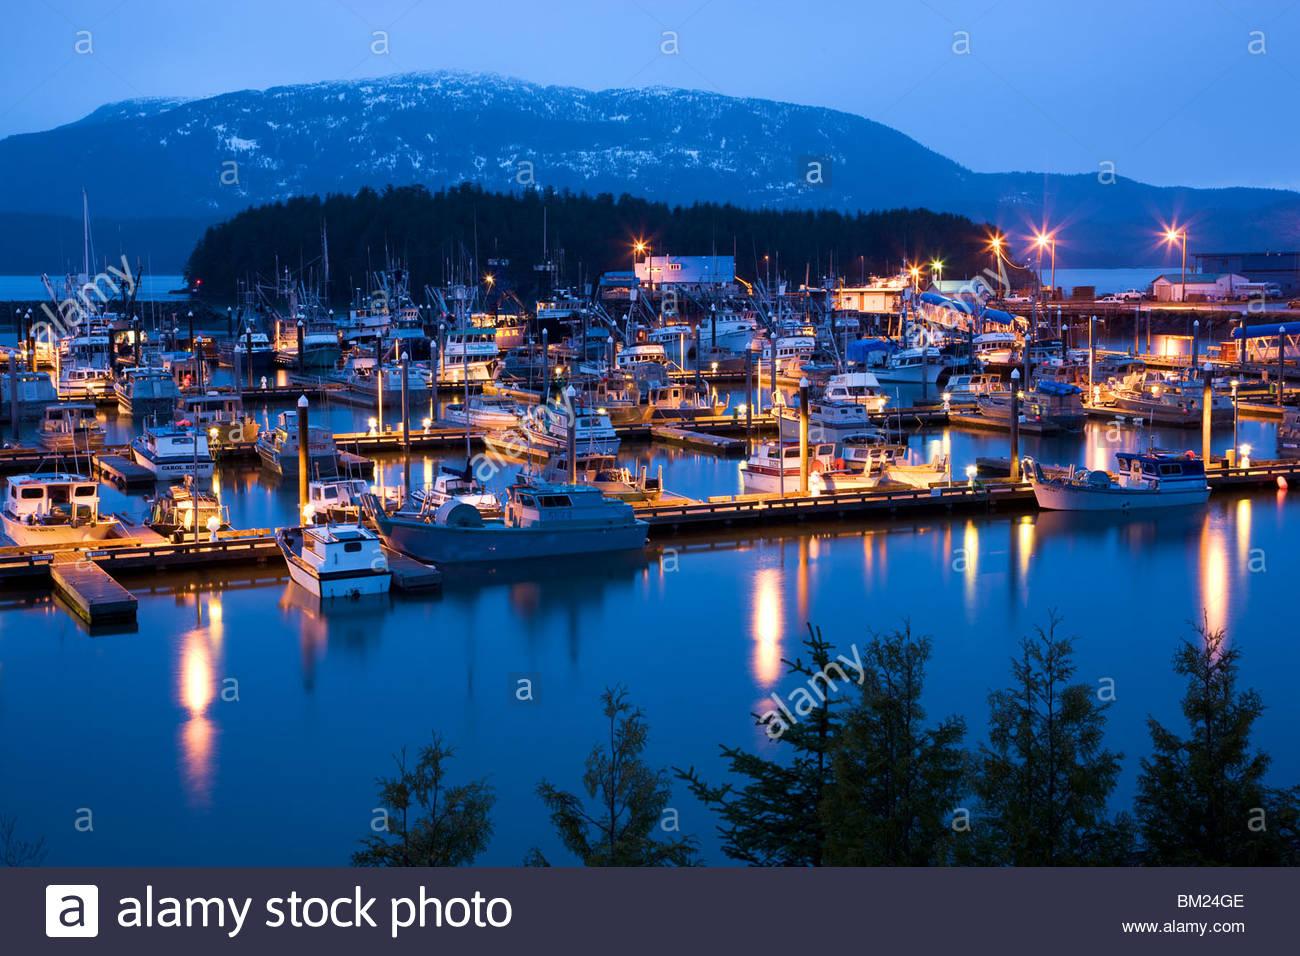 Boat Harbor at night during a rain strom, Cordova, Alaska. - Stock Image